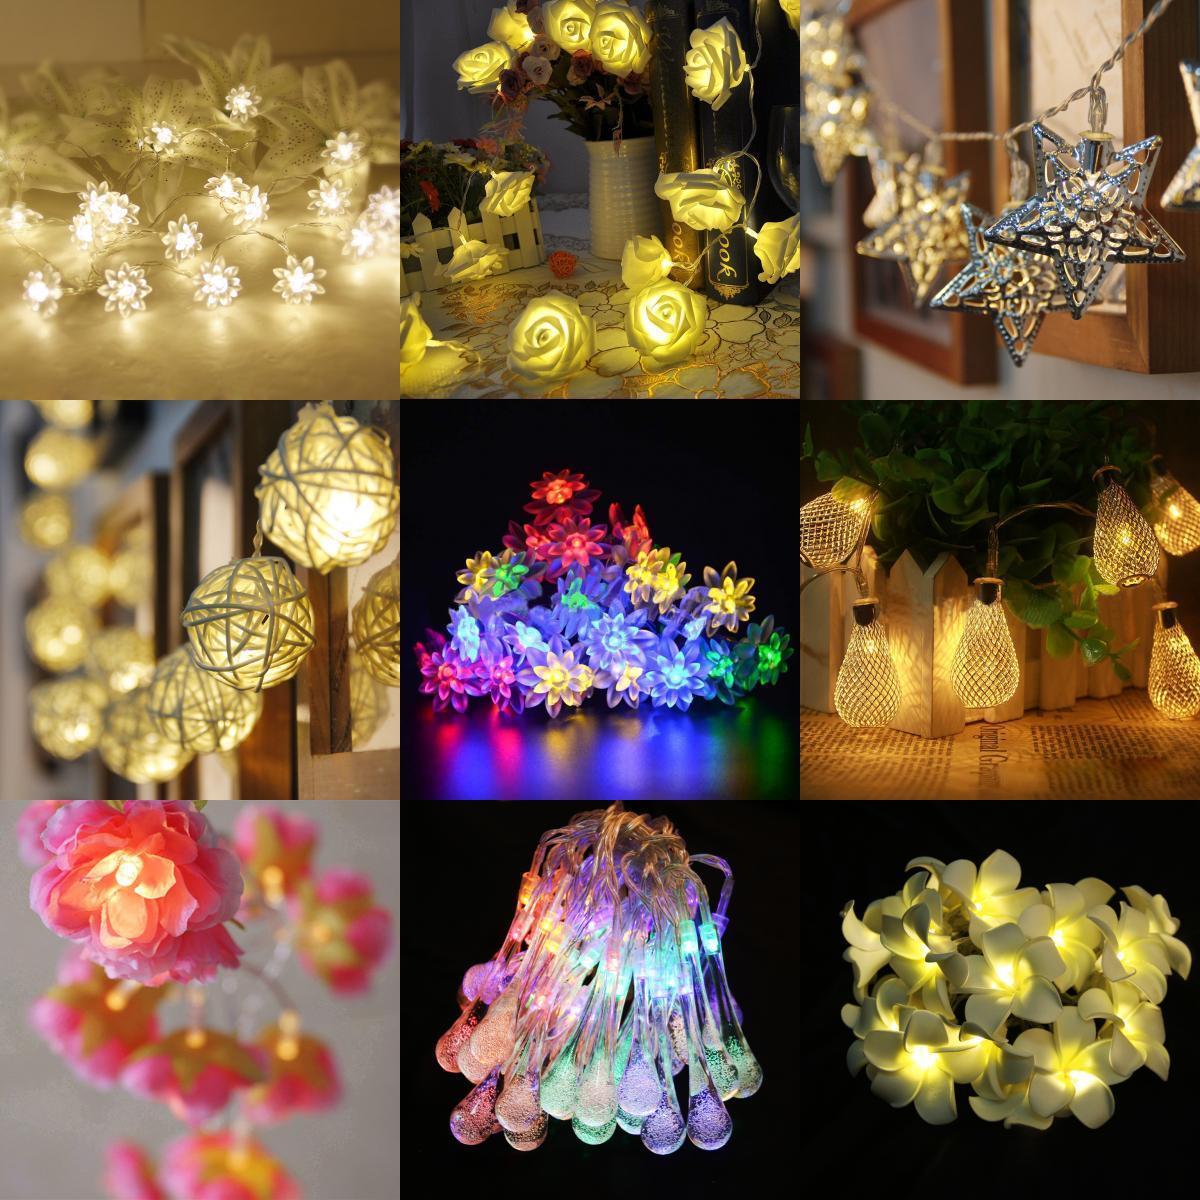 20 LED Battery Operated Flowers String Fairy Light Xmas Wedding Decor 2M